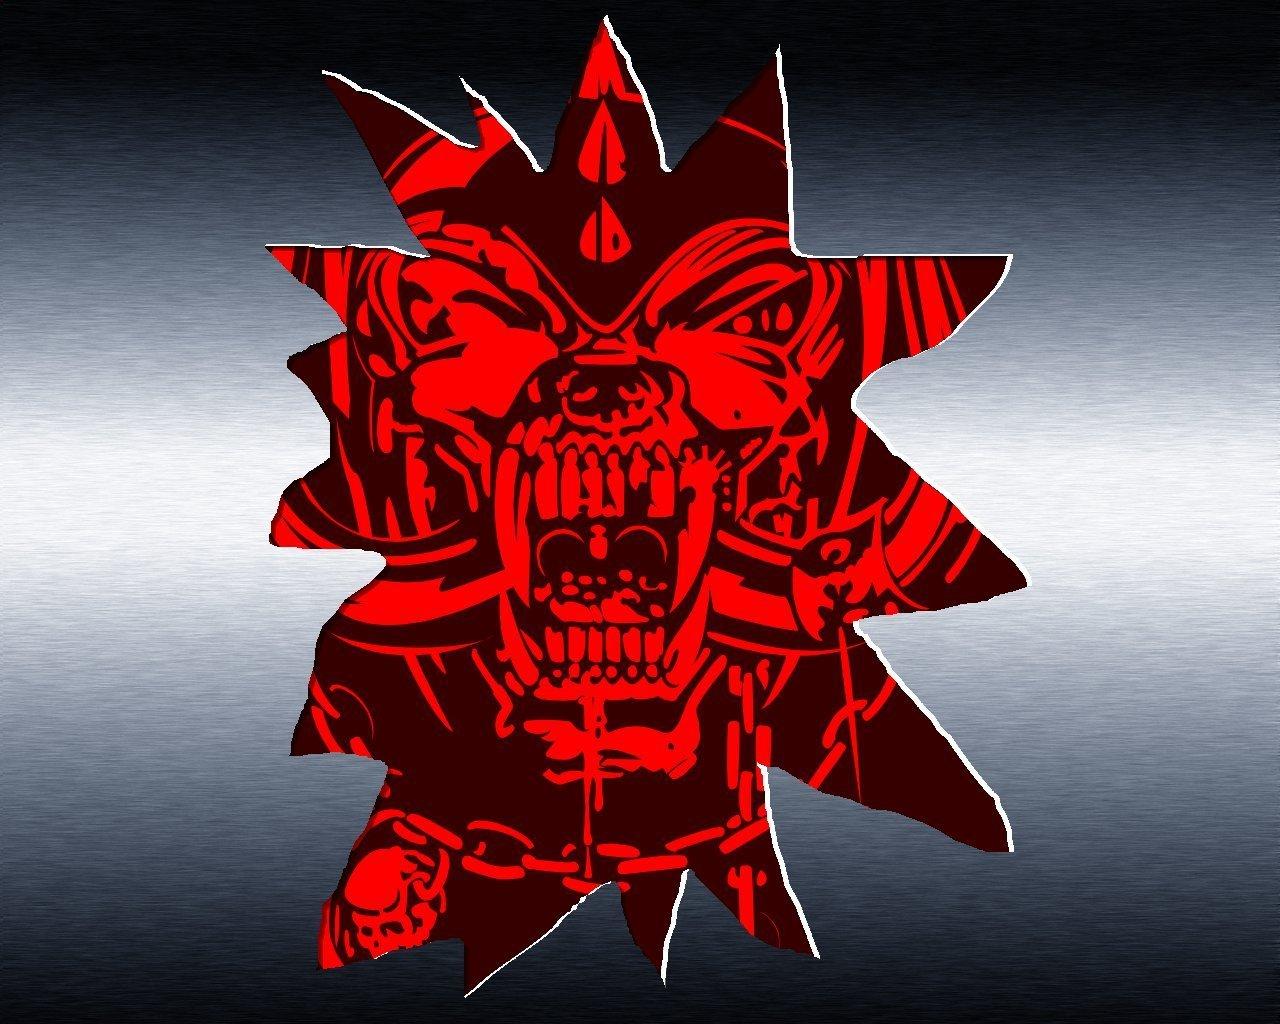 heavy metal fond d ecran metal fond d ecran 21000456 fanpop